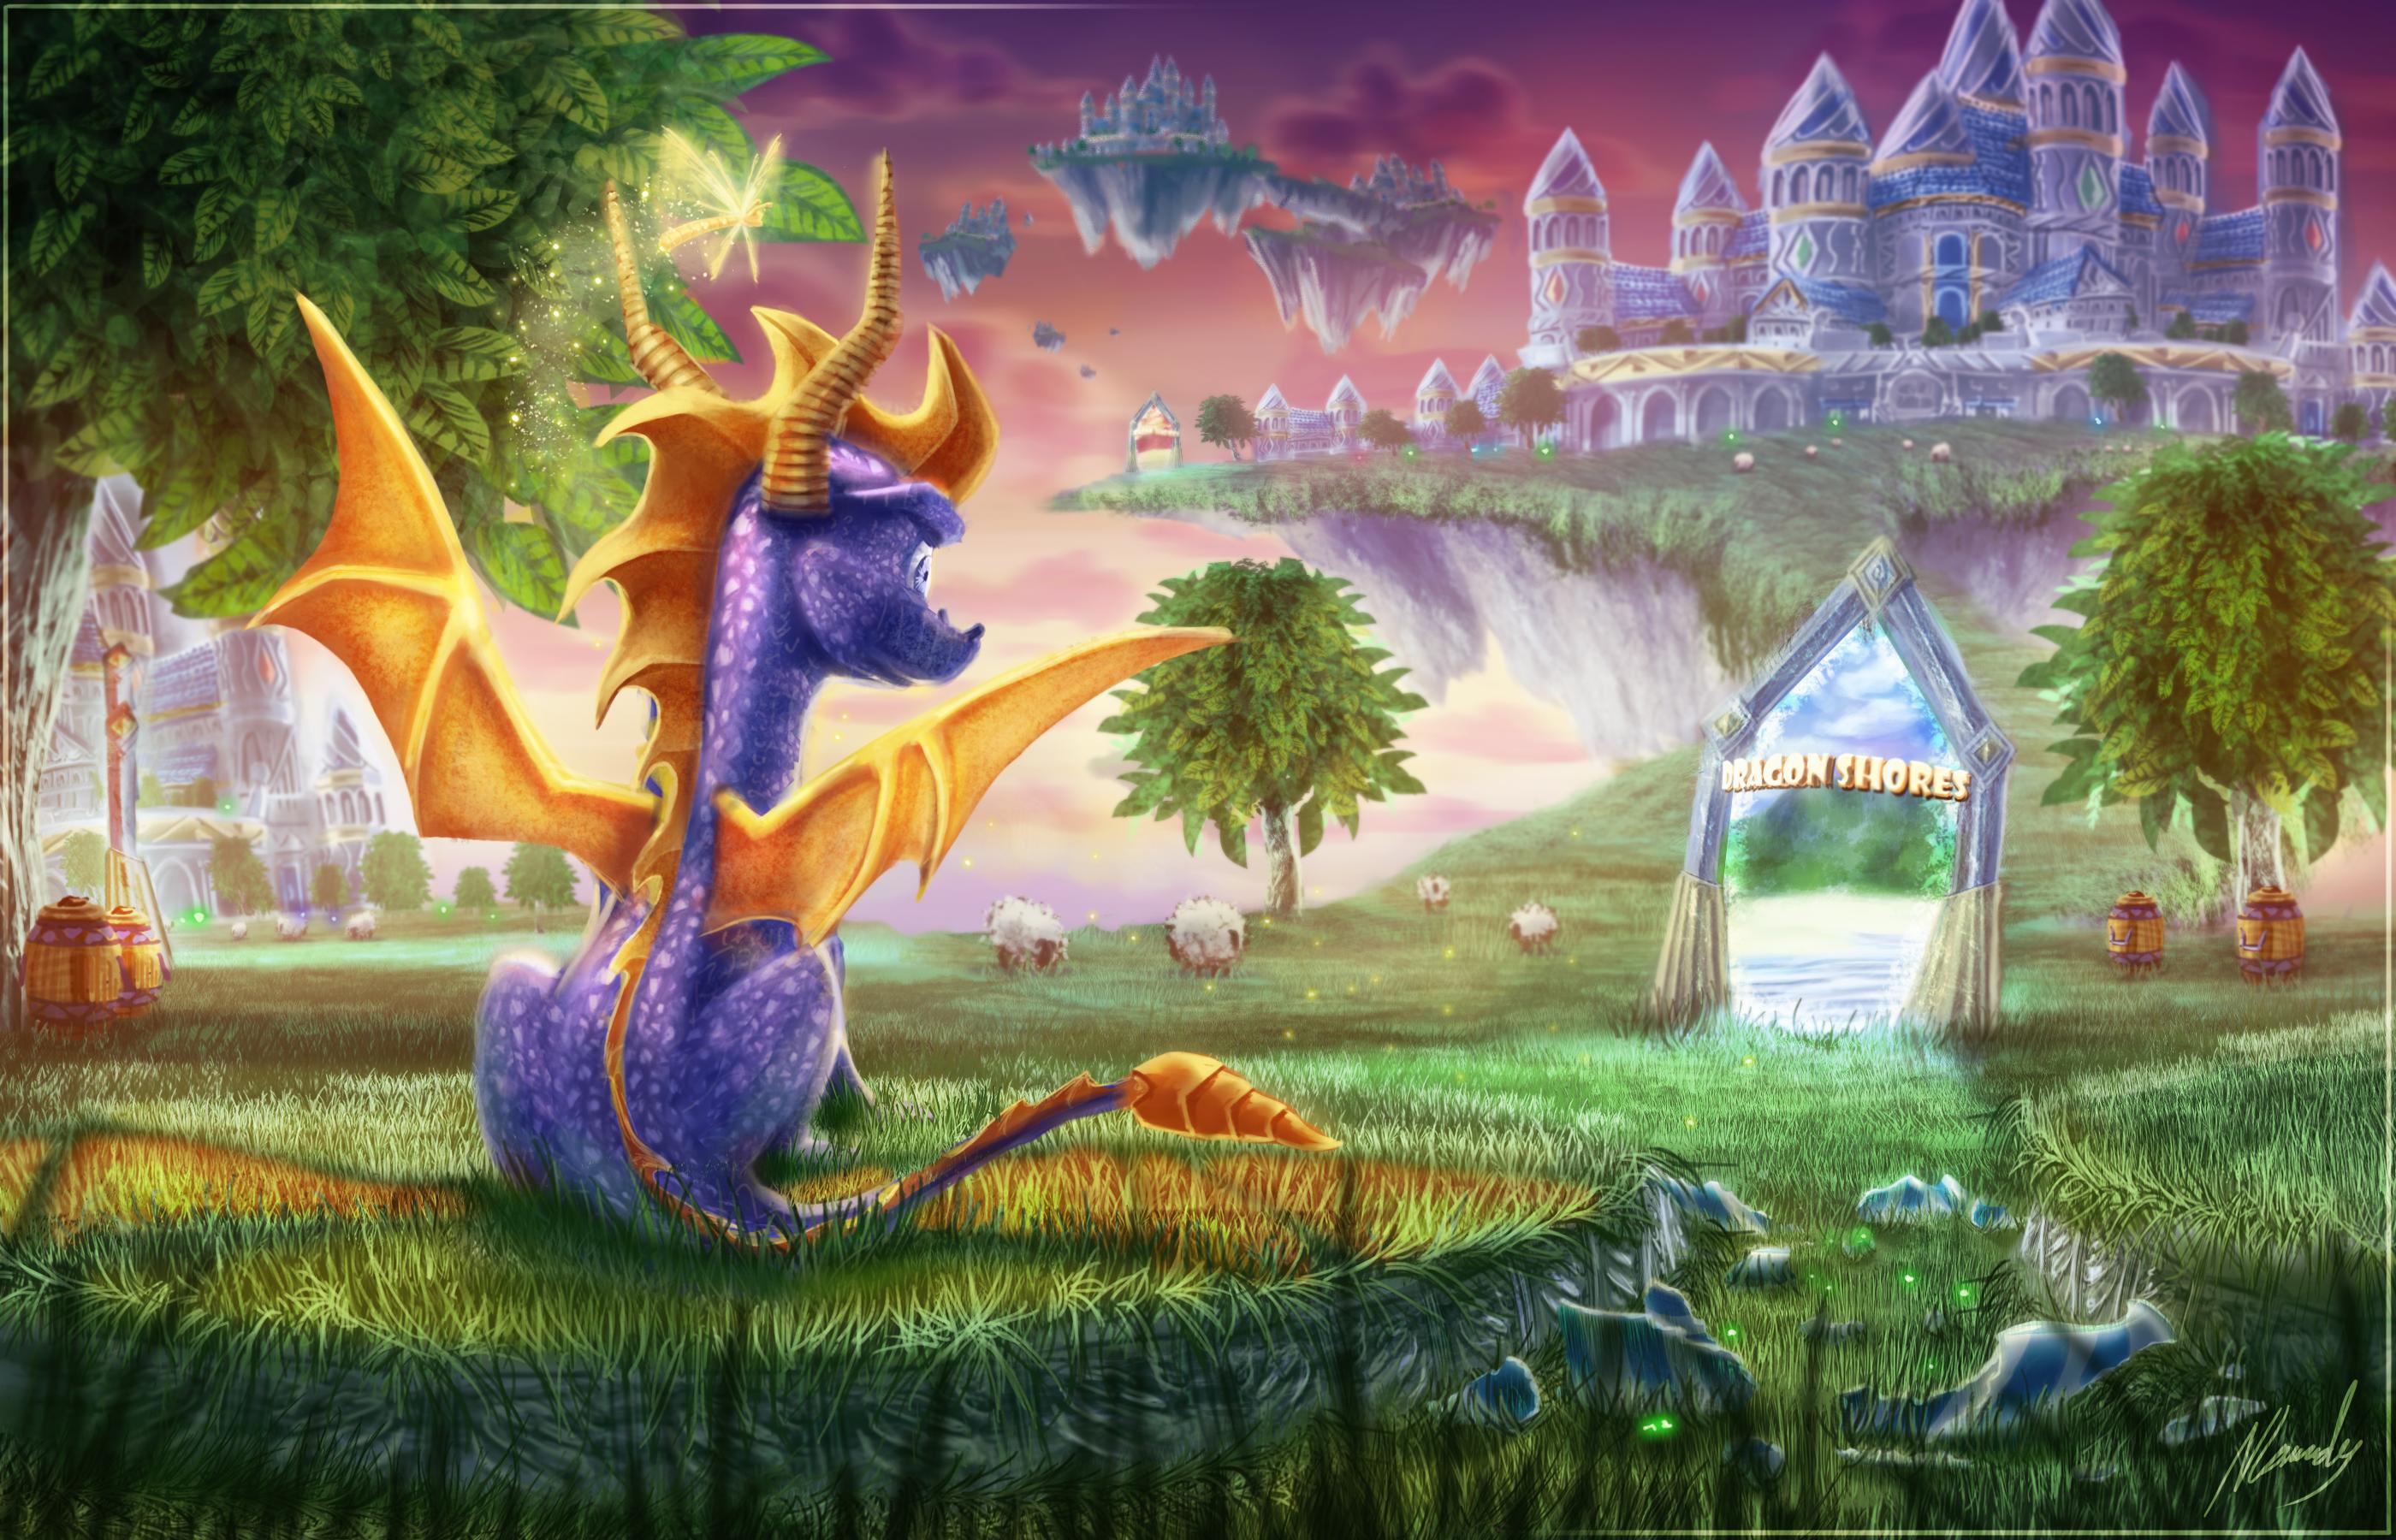 72 Spyro The Dragon HD Wallpapers